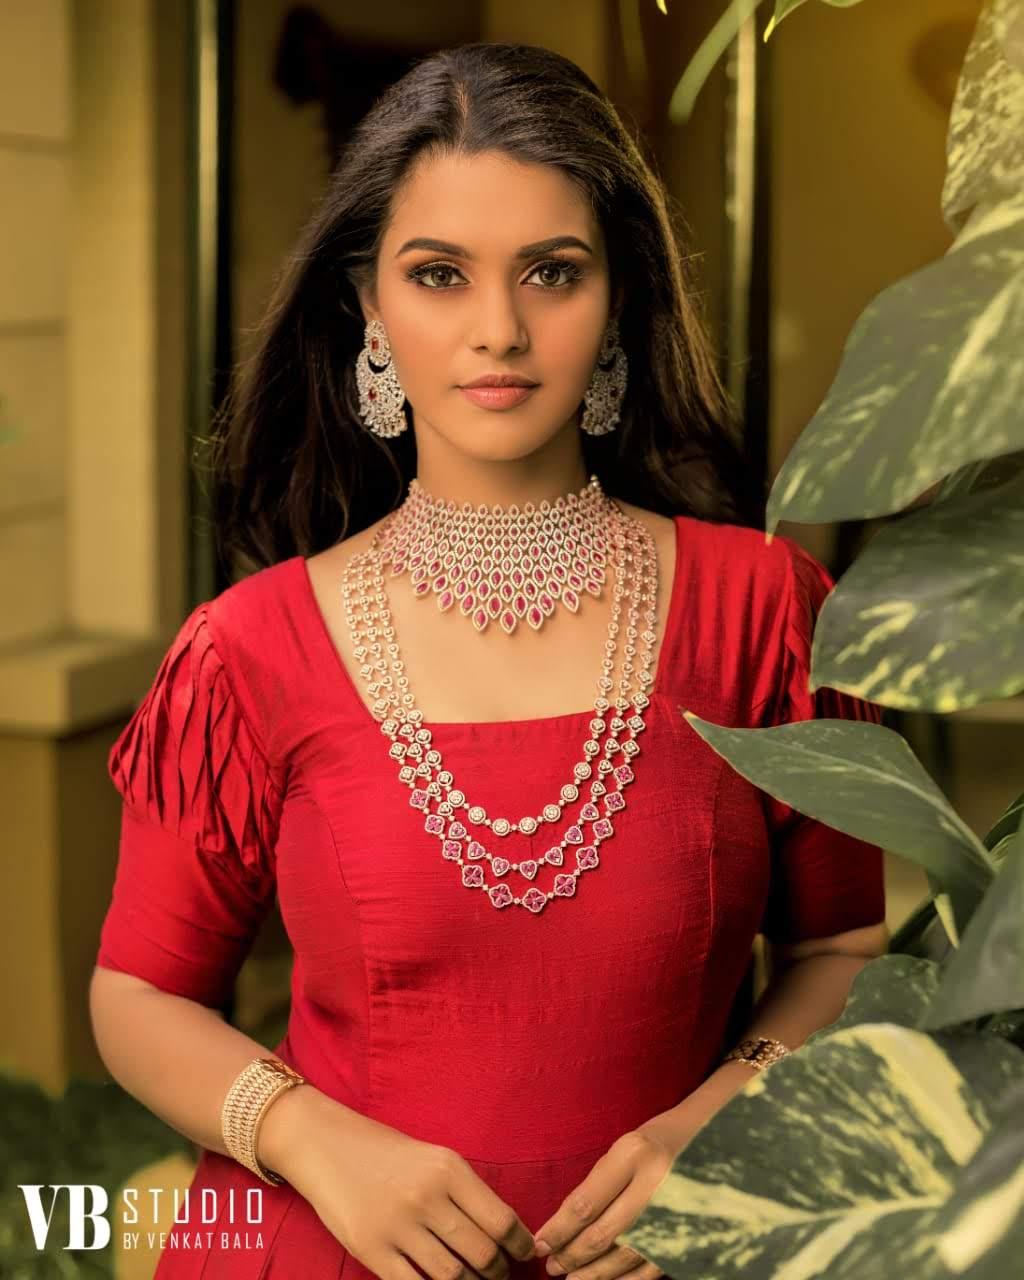 Roshni-Prakash-images-956575